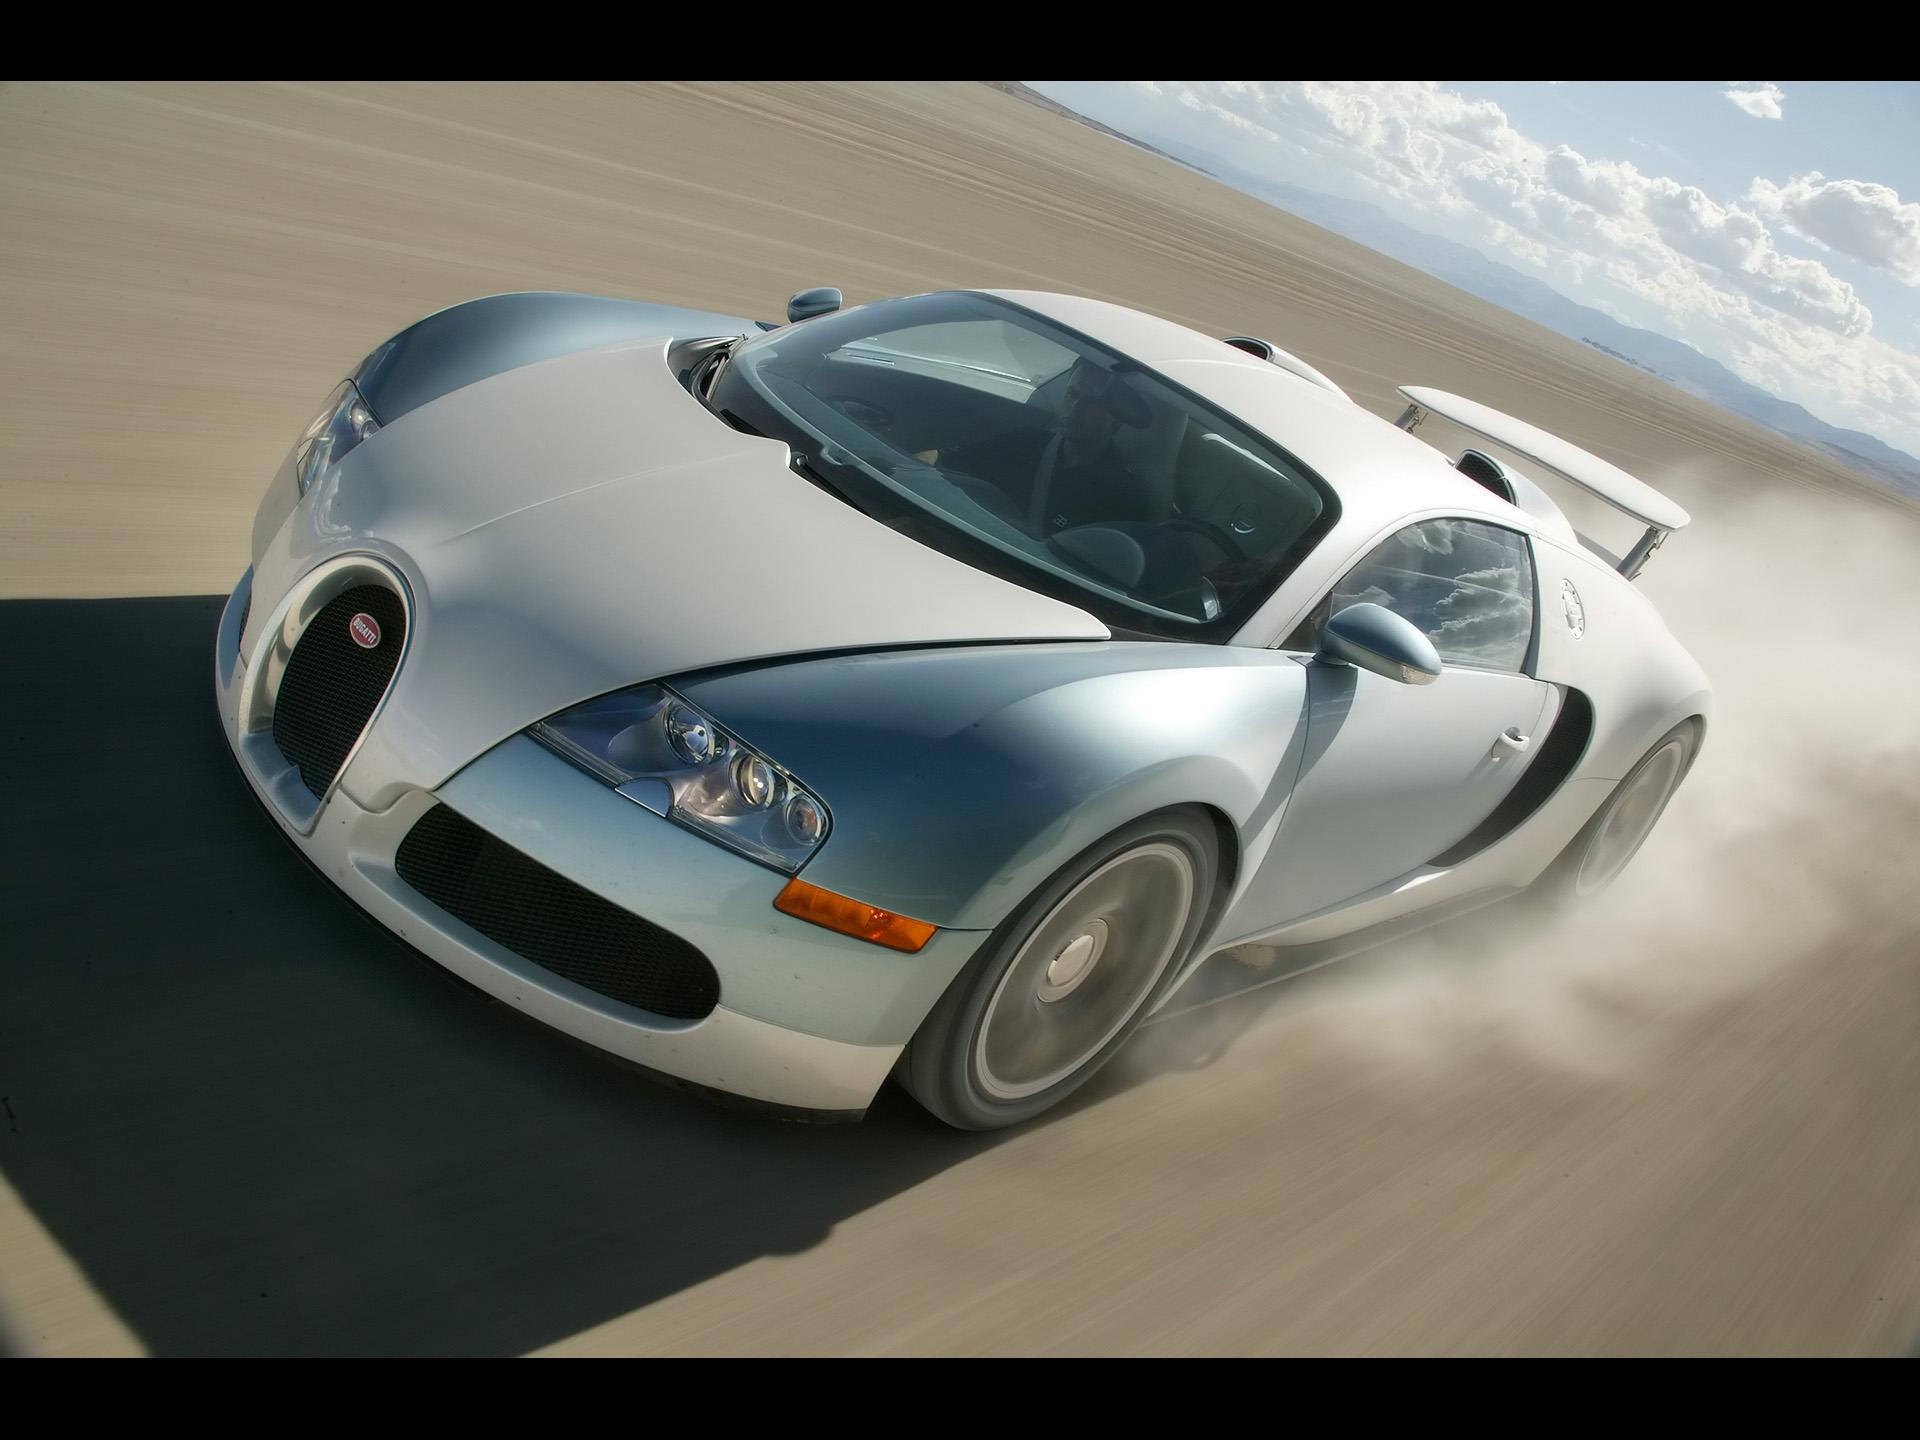 Bugatti-Veyron-manu-07_01 Modern Bugatti Veyron Price and Pictures Cars Trend